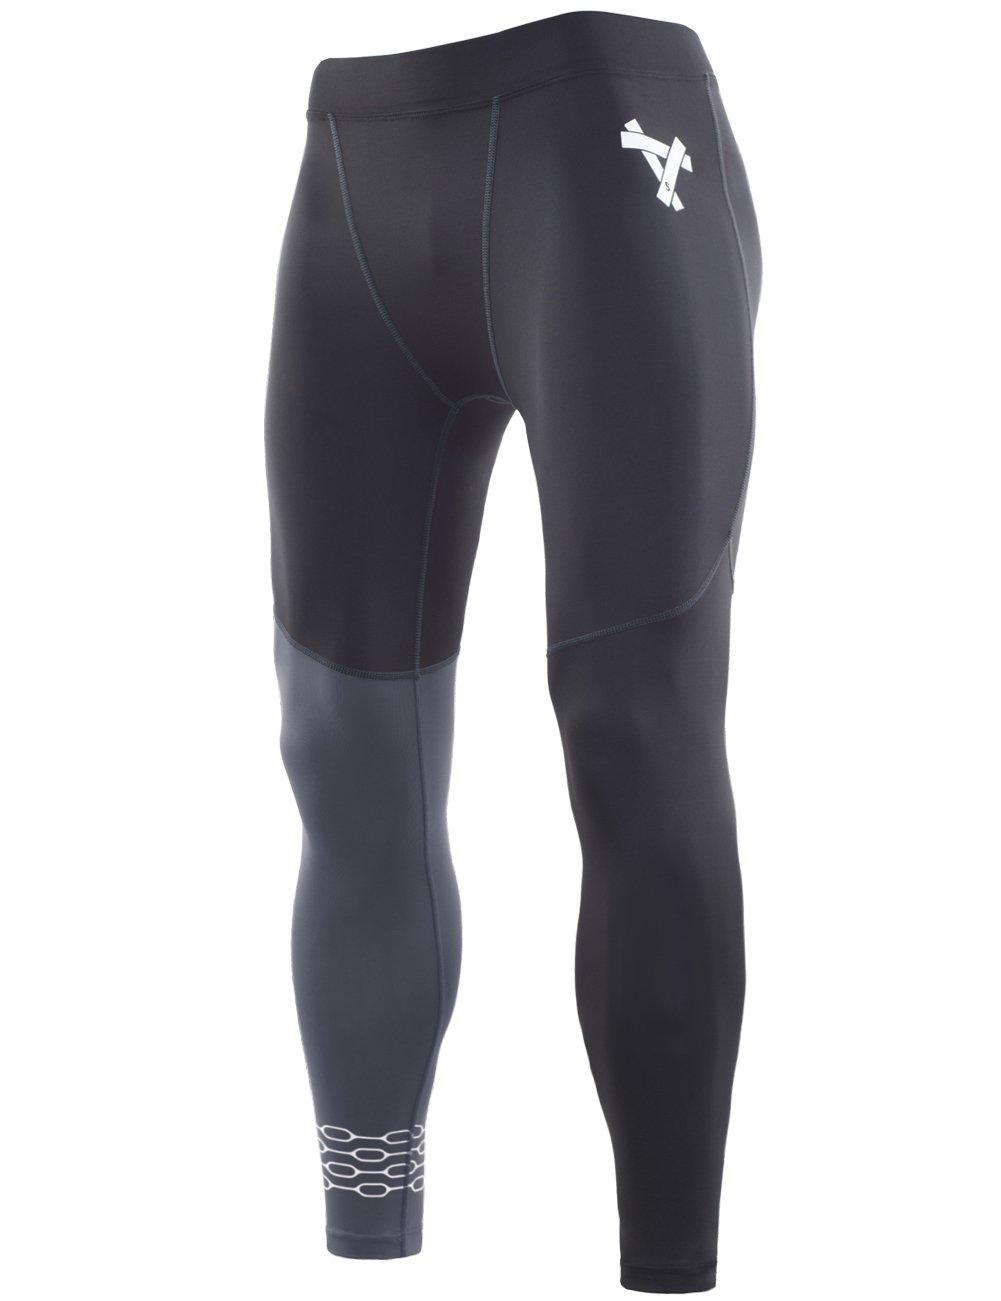 Lavento Men's Compression Pants Baselayer Cool Dry